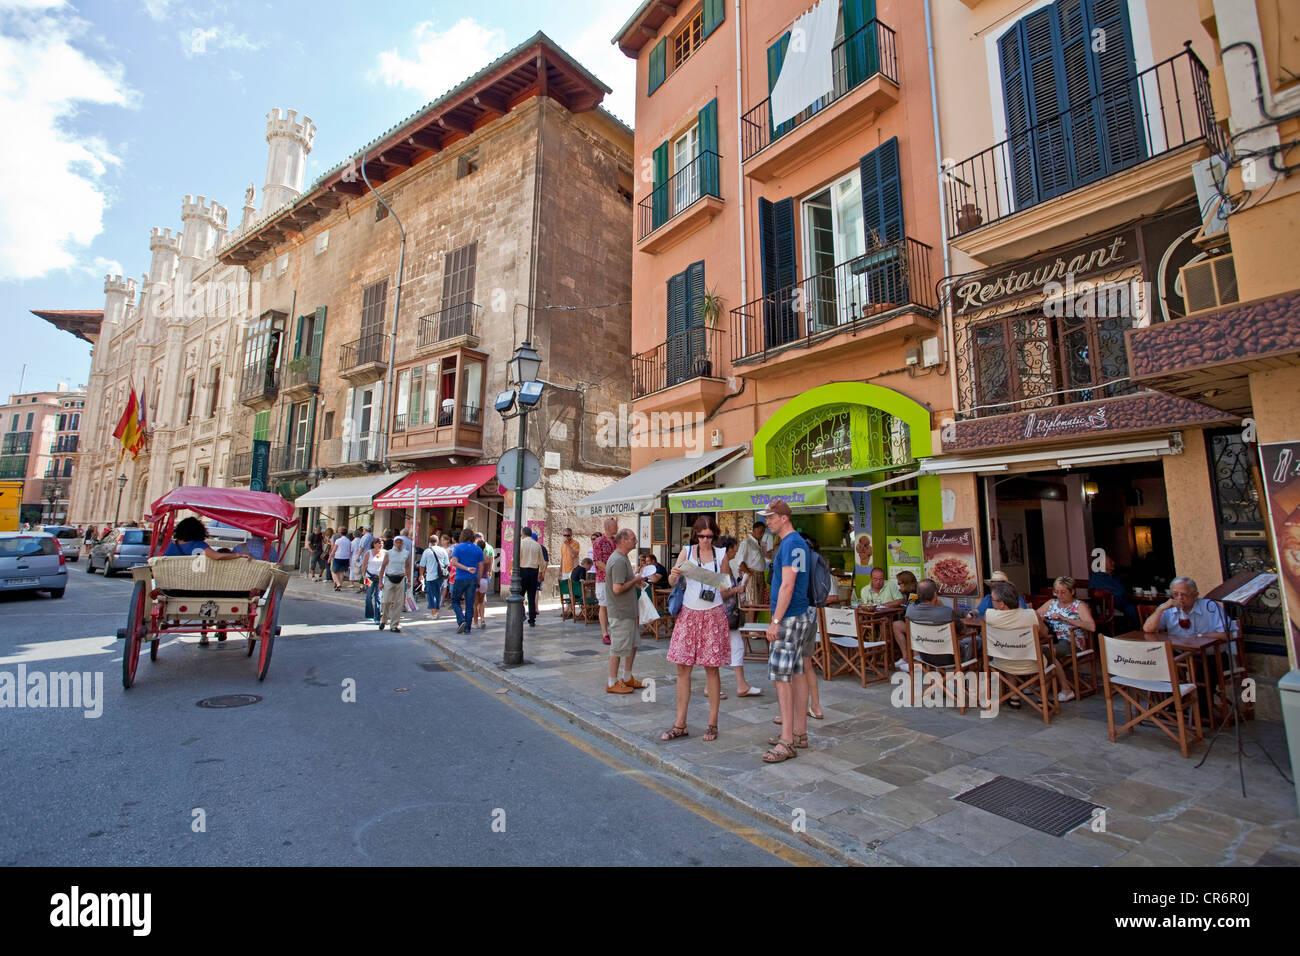 Sidewalk cafe in the historic district, Palma de Mallorca, Majorca, Balearic islands, Spain, Europe - Stock Image